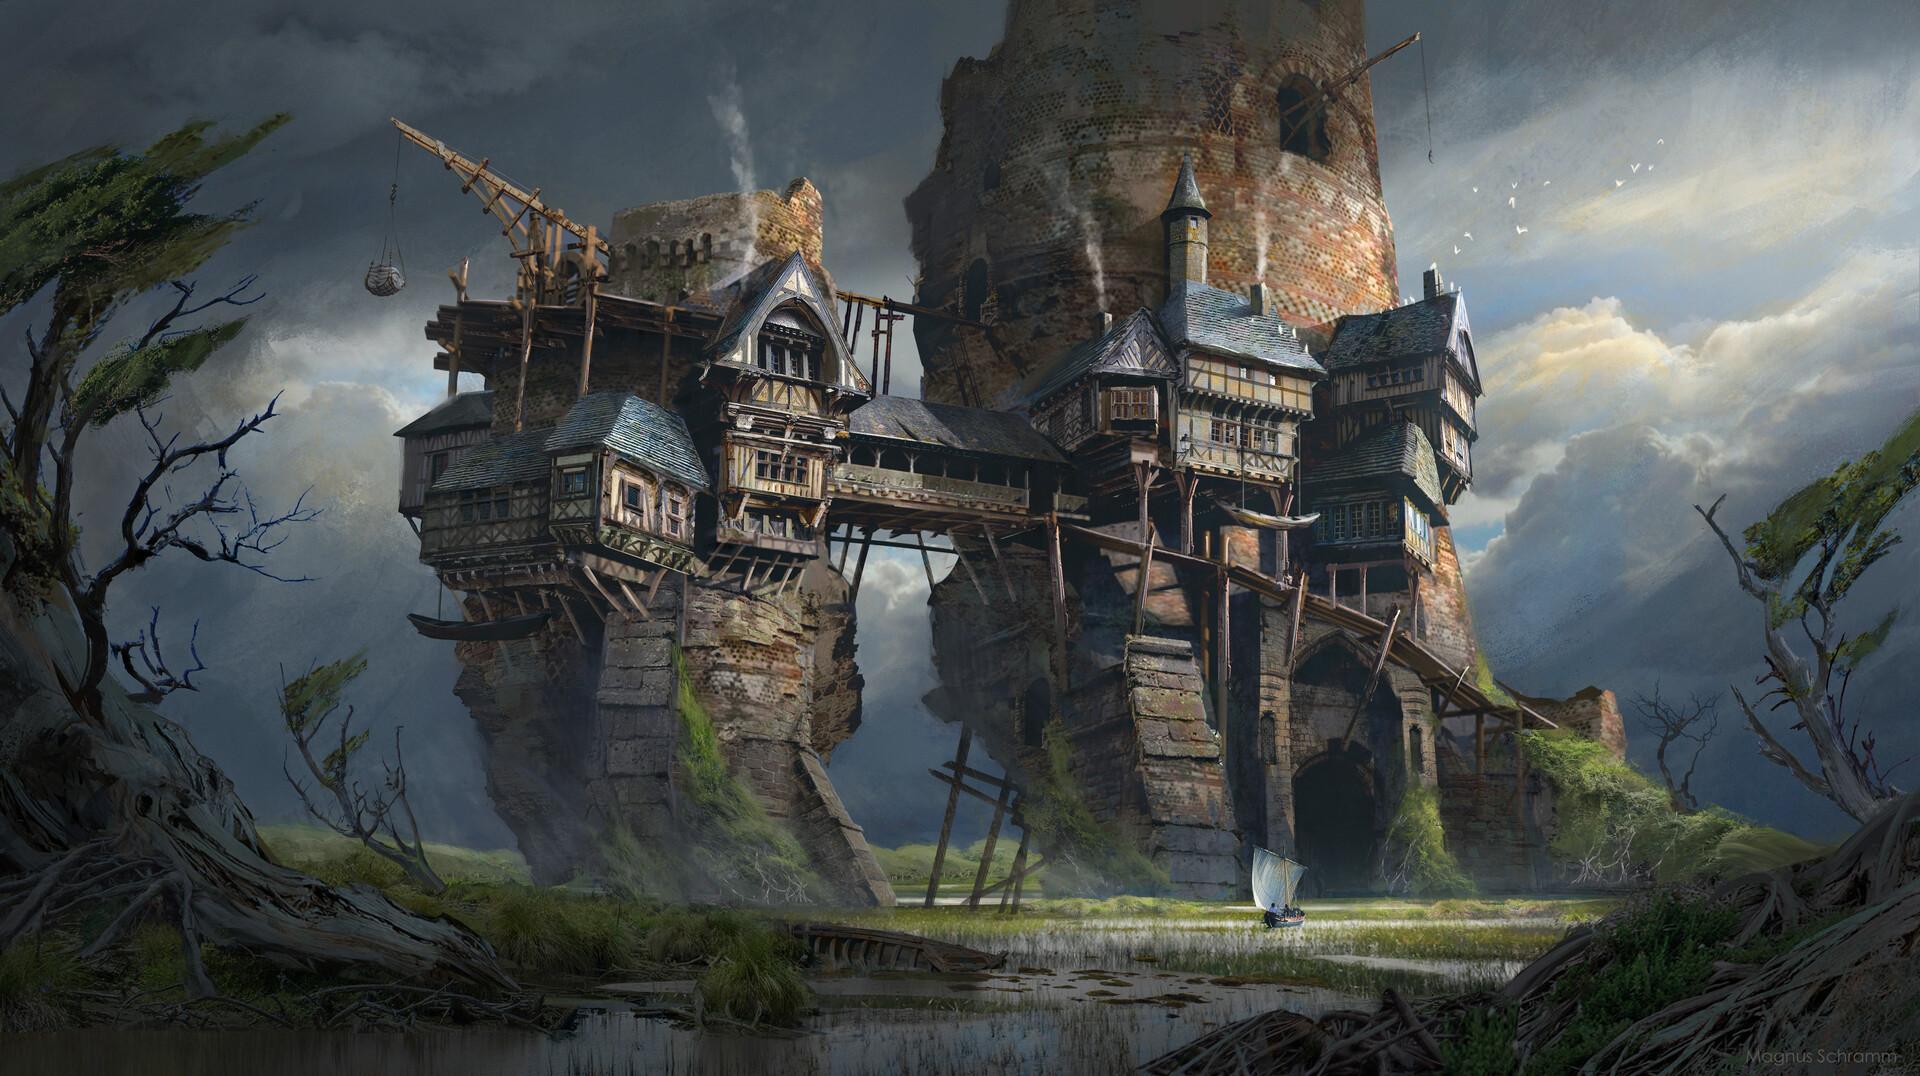 ArtStation - Swamp outpost, Magnus Schramm | Fantasy landscape, Environment  concept art, Fantasy places